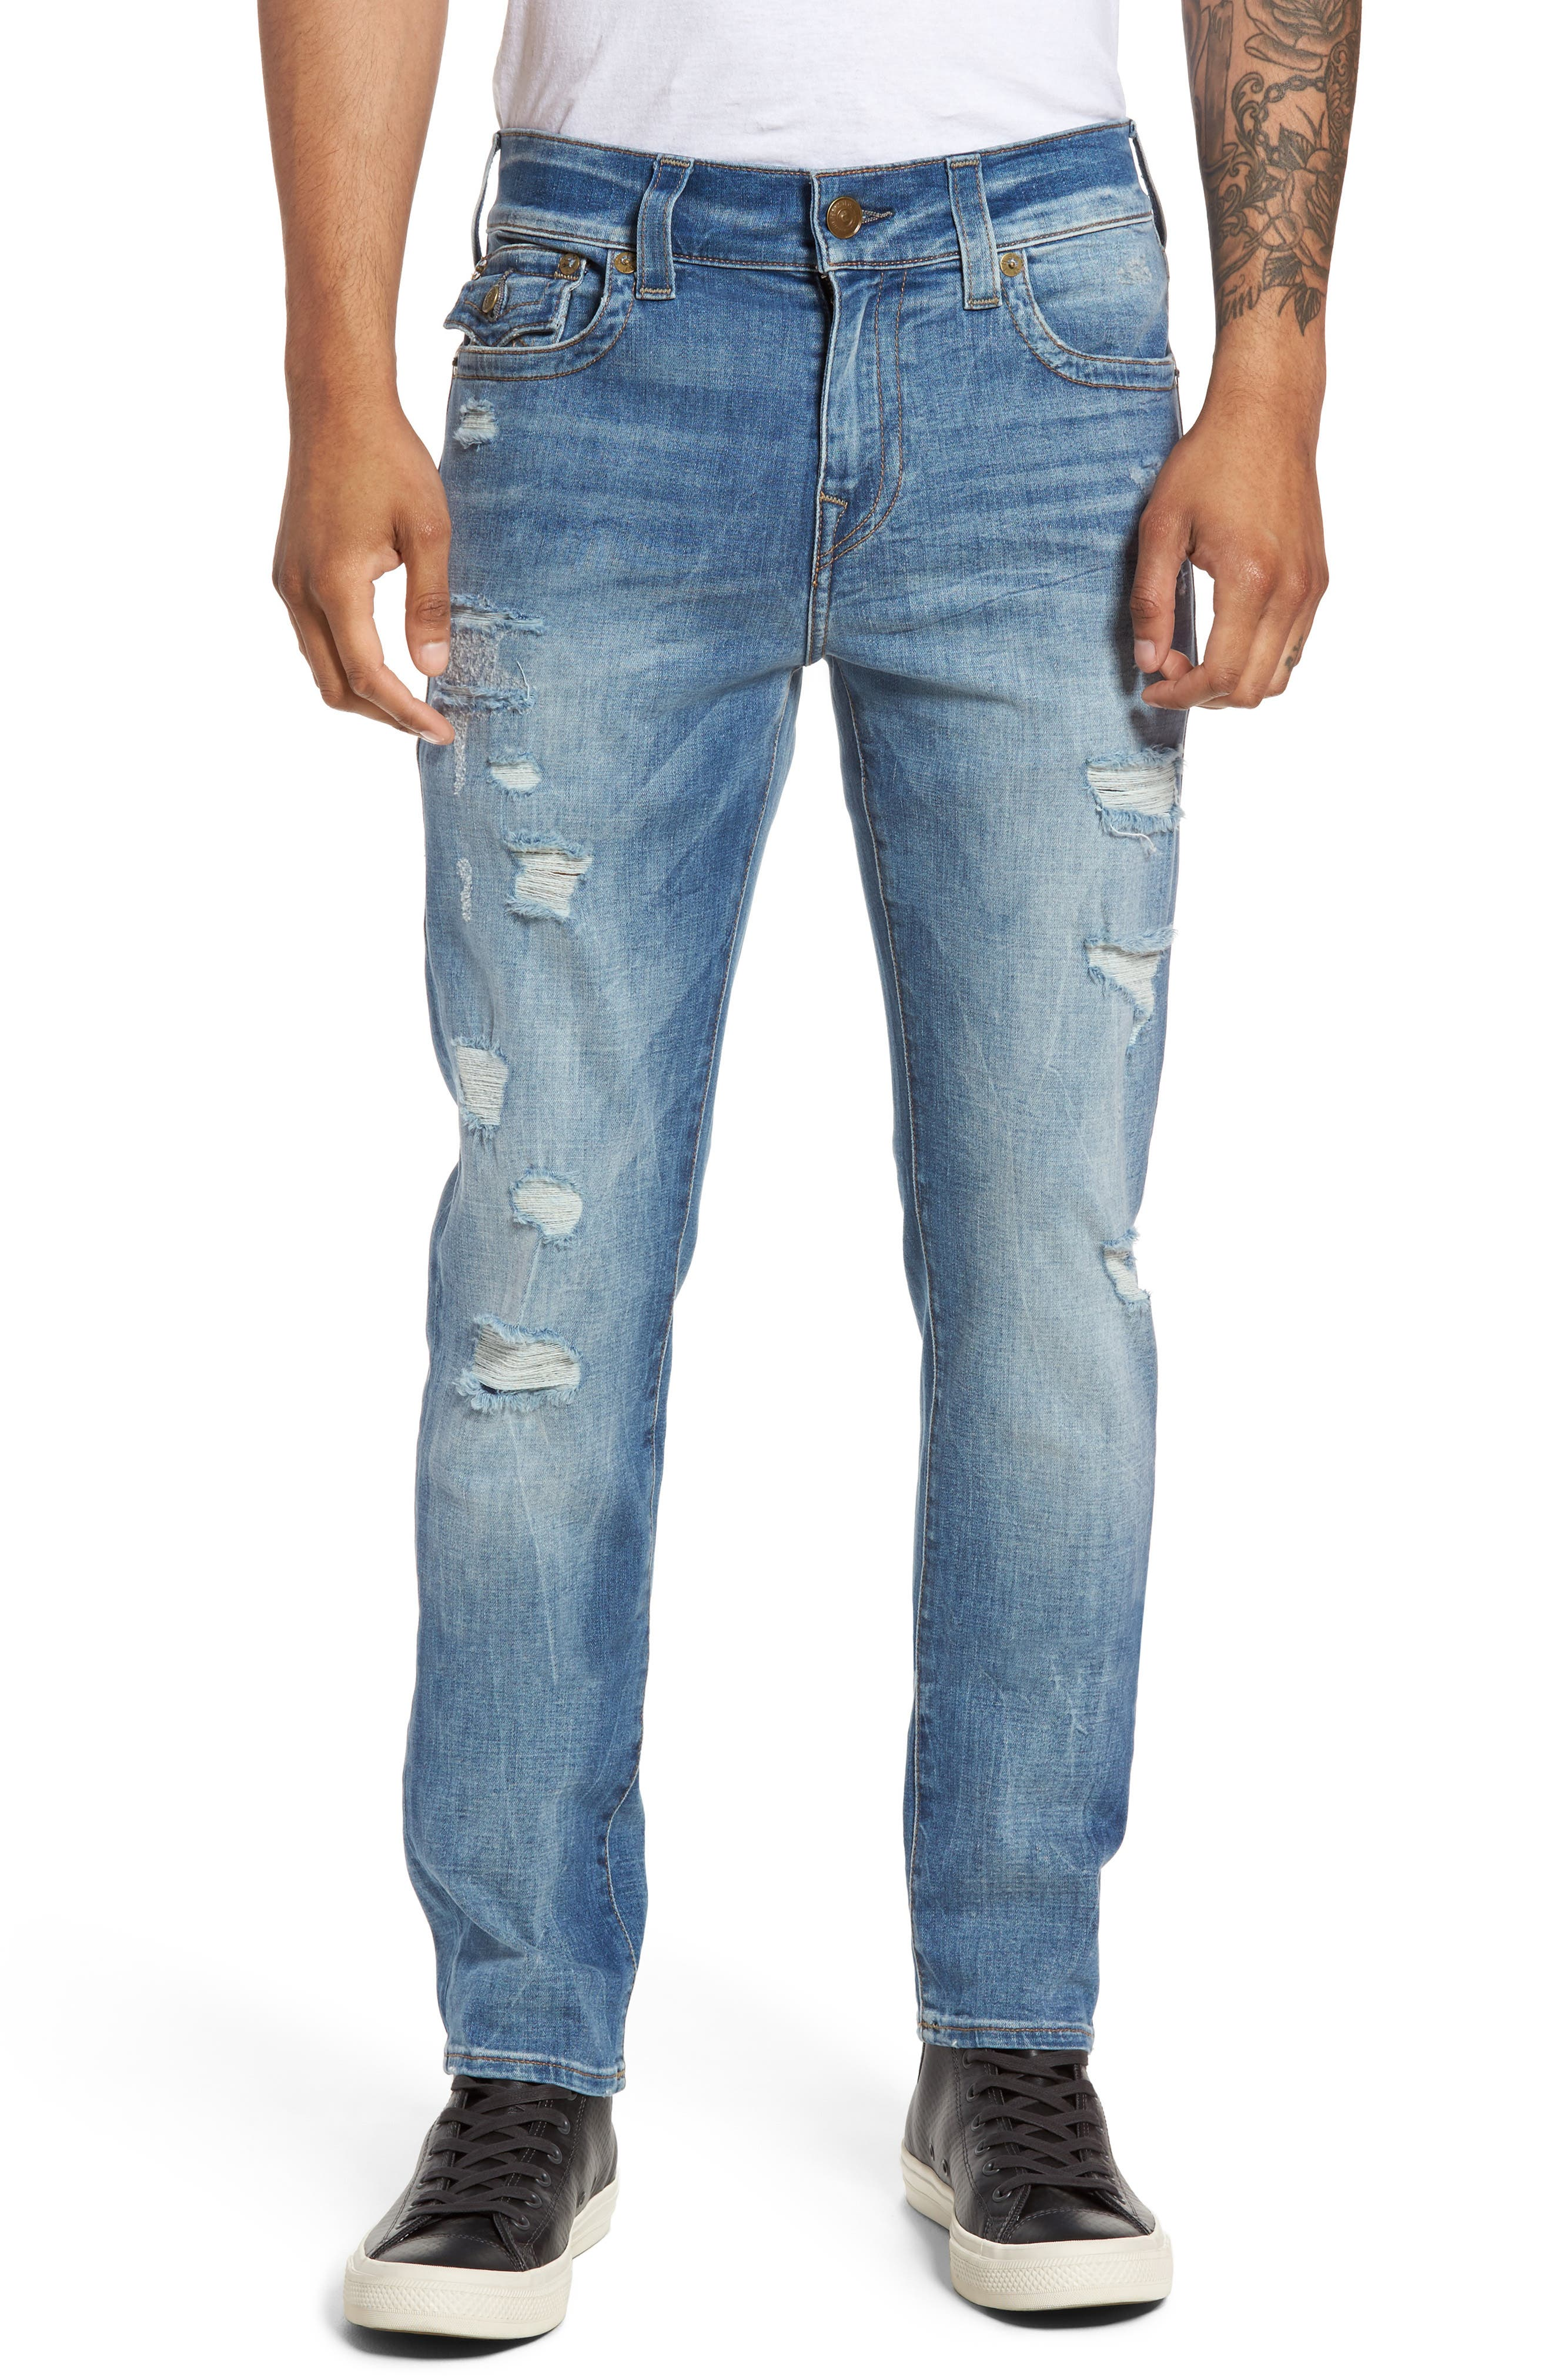 True Religion Brand Jeans Rocco Skinny Fit Jeans (Worn Riff) (Regular & Big)